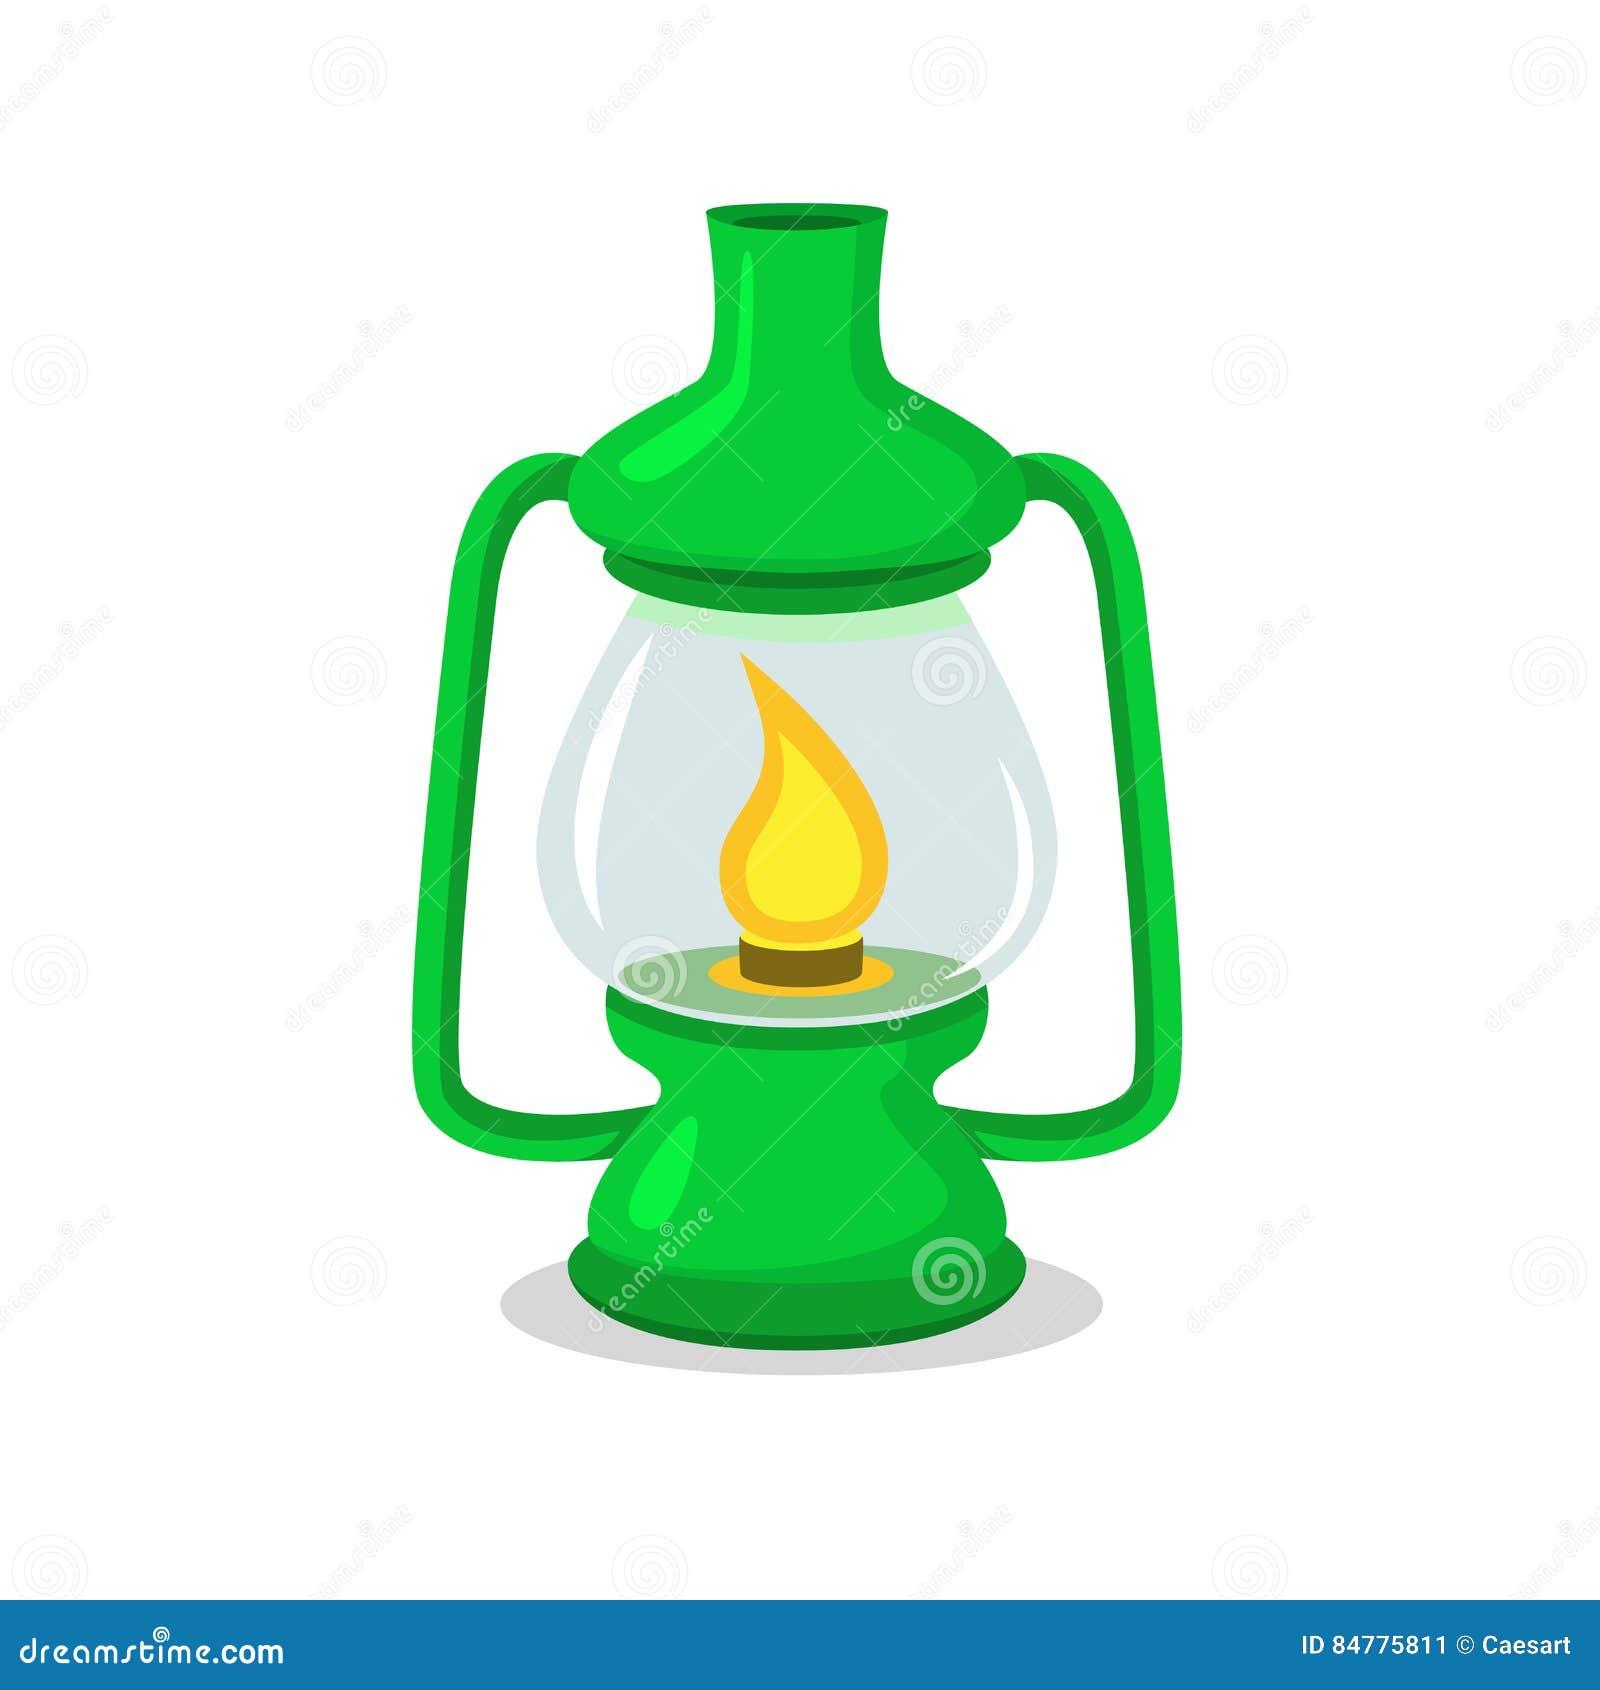 Camping Lantern Stock Illustrations – 1,739 Camping Lantern Stock ... for Camping Lantern Clipart  76uhy